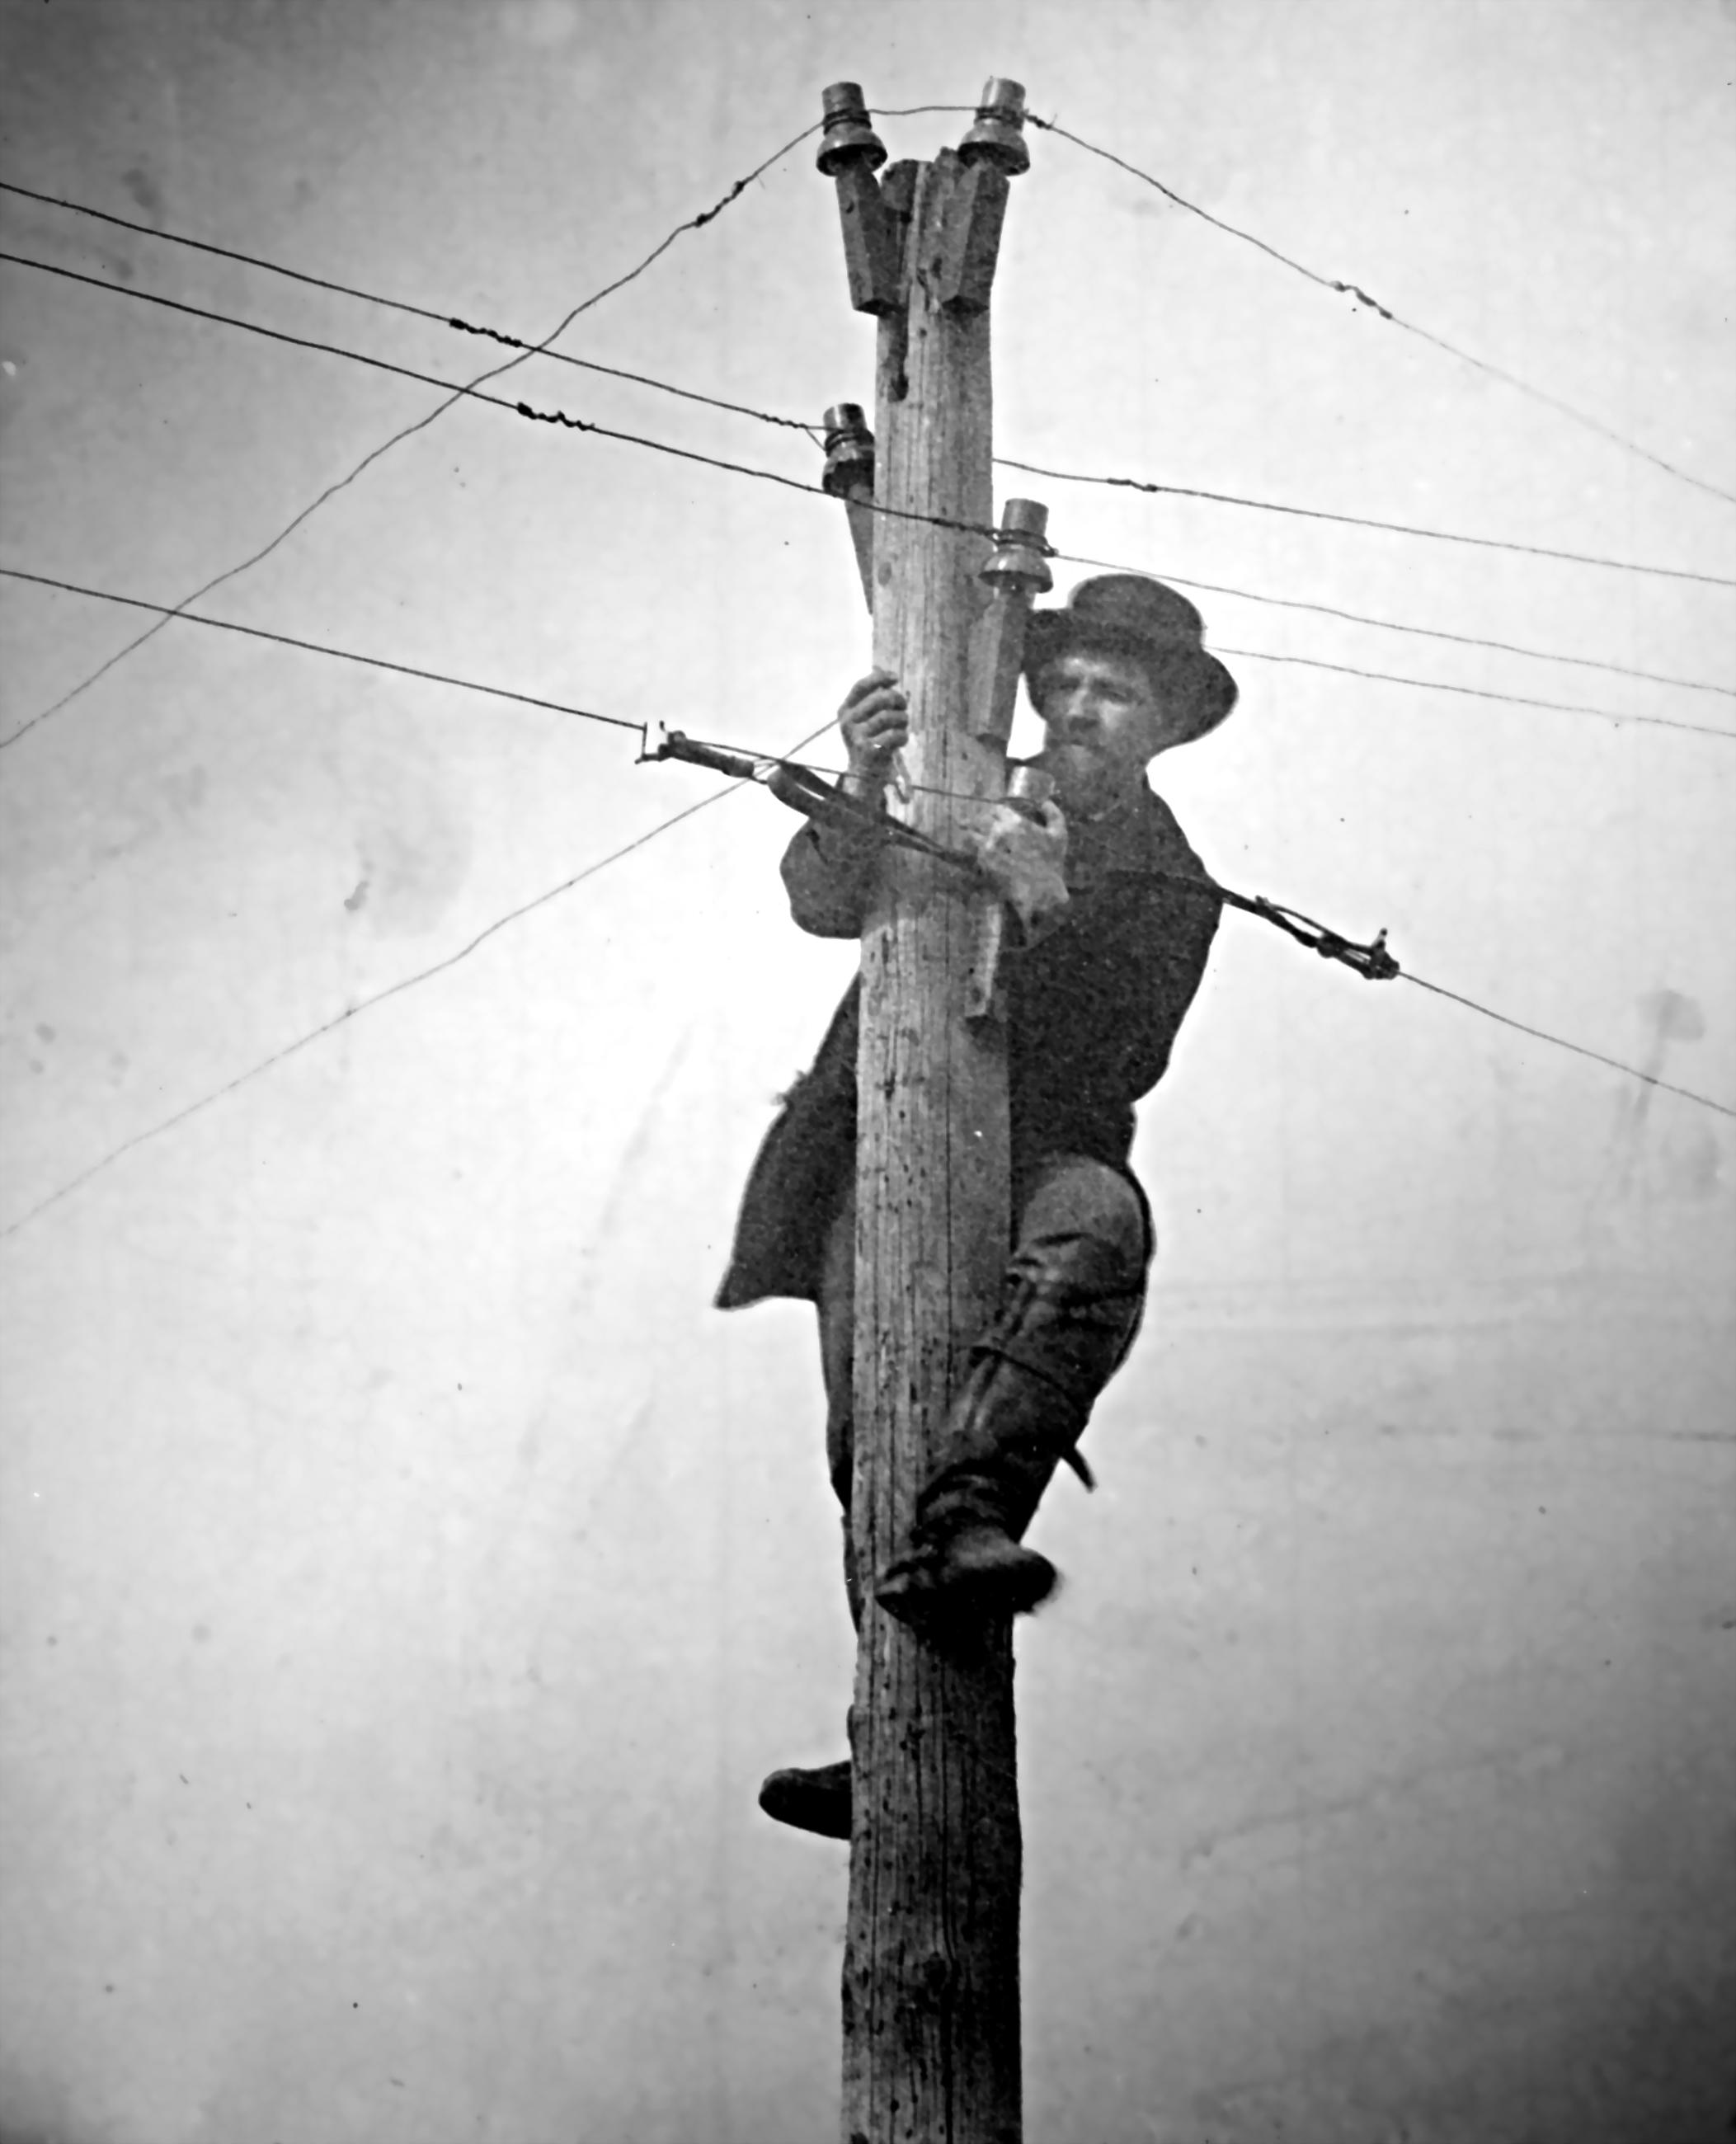 File:Cutting telegraph wire (restored).JPG - Wikimedia Commons